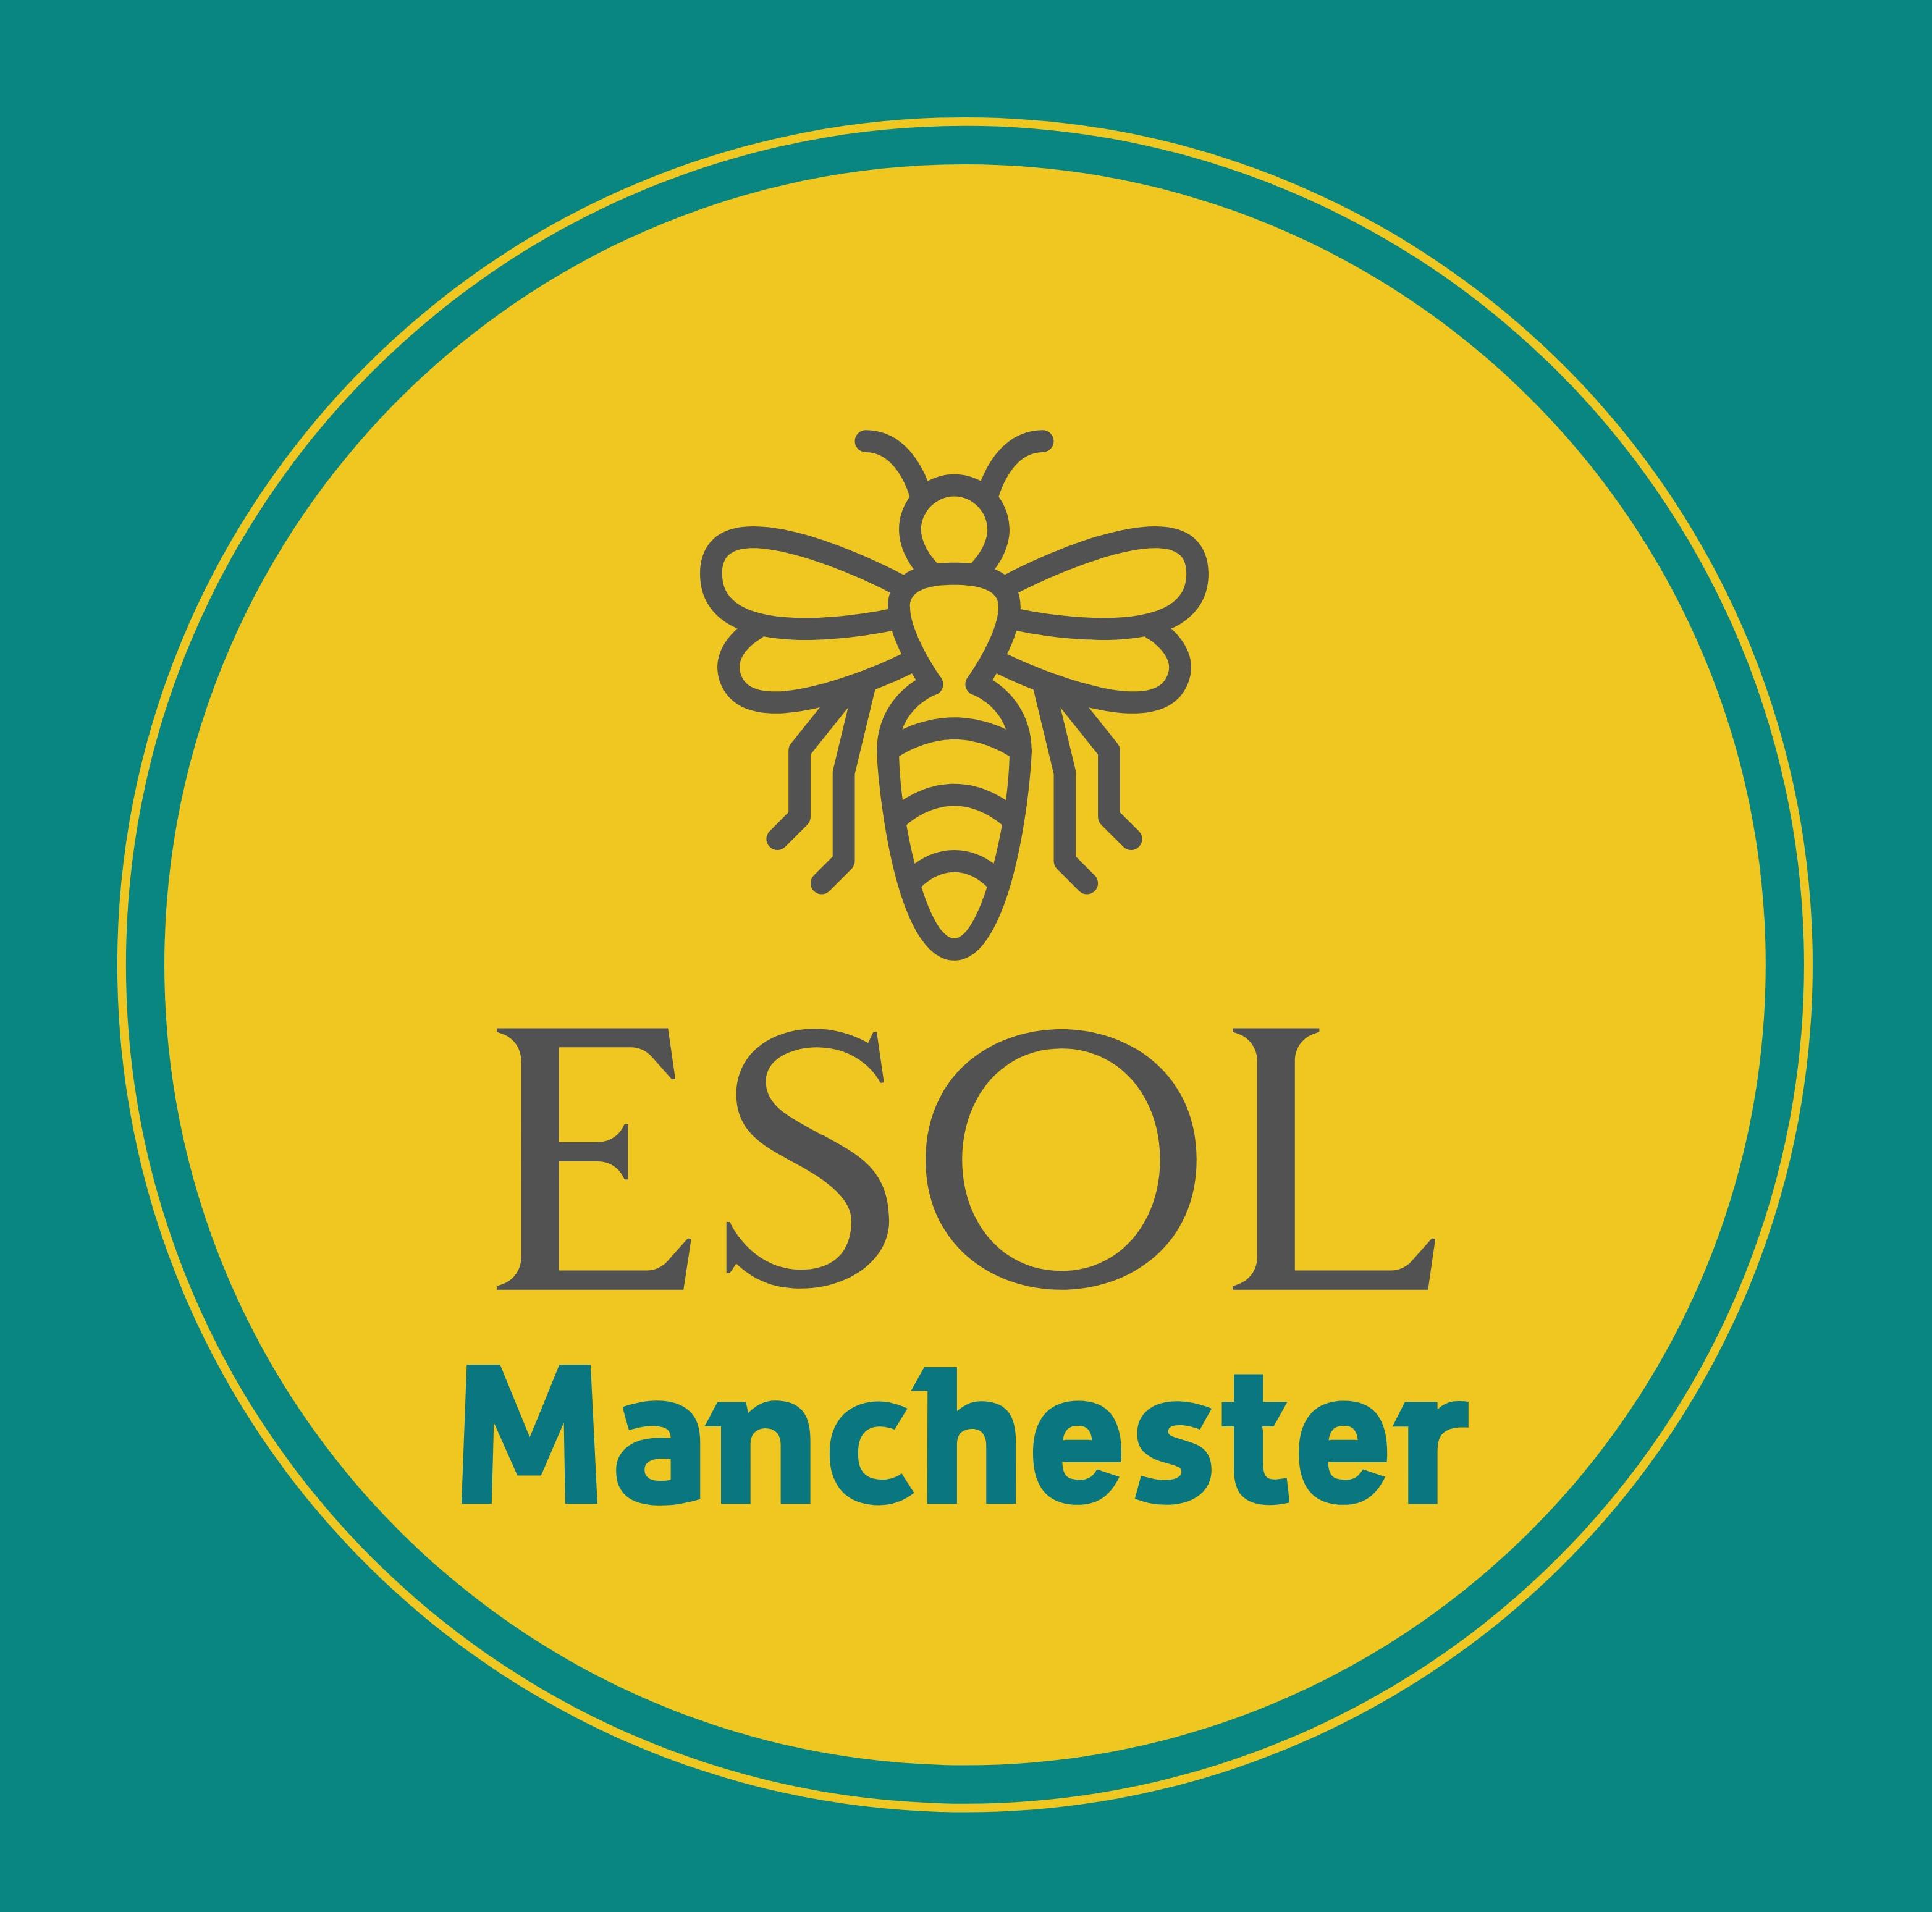 Manchester ESOL